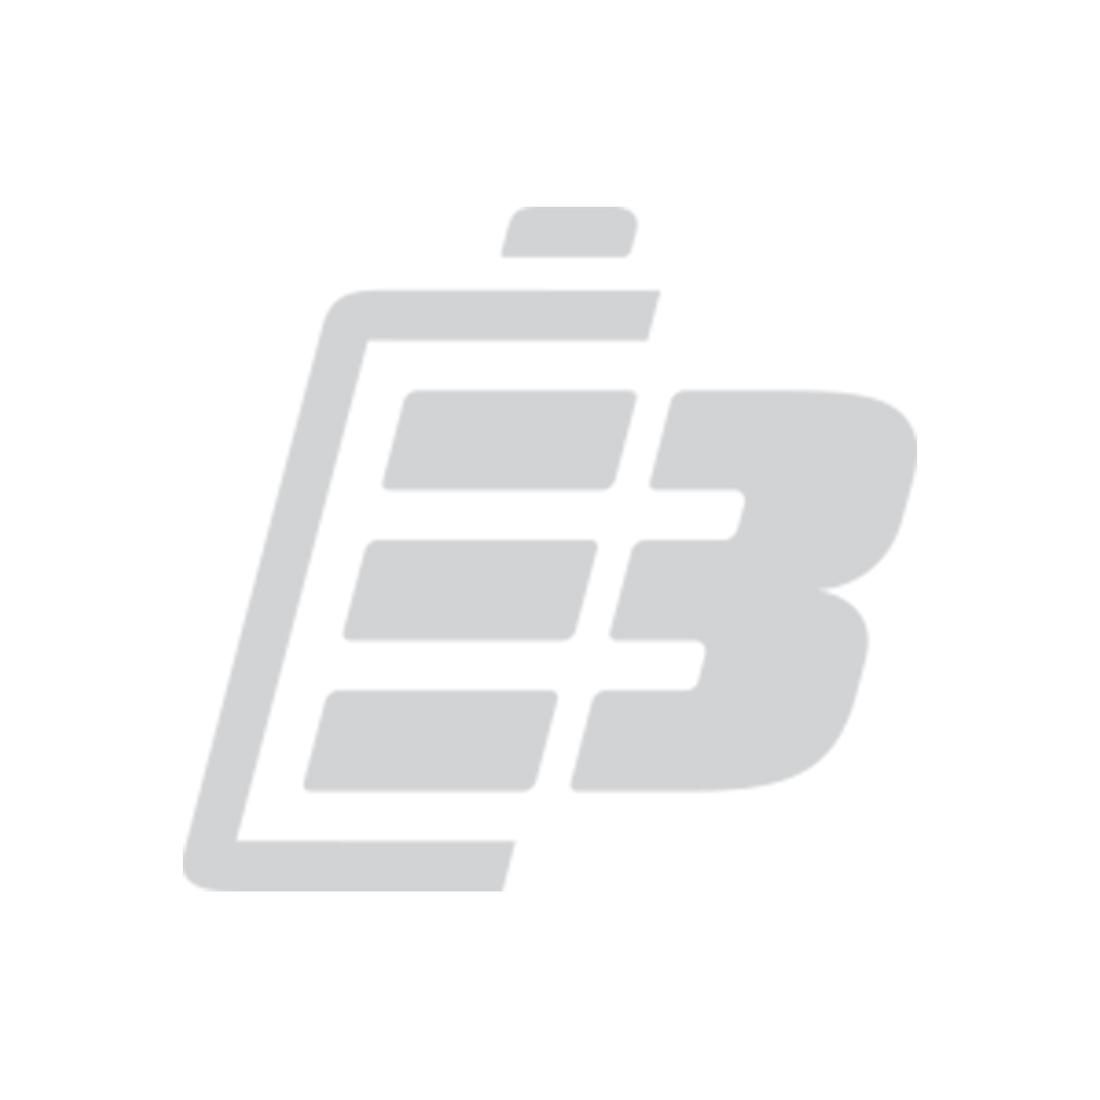 Choetech C0030 2 x USB Wall Adapter